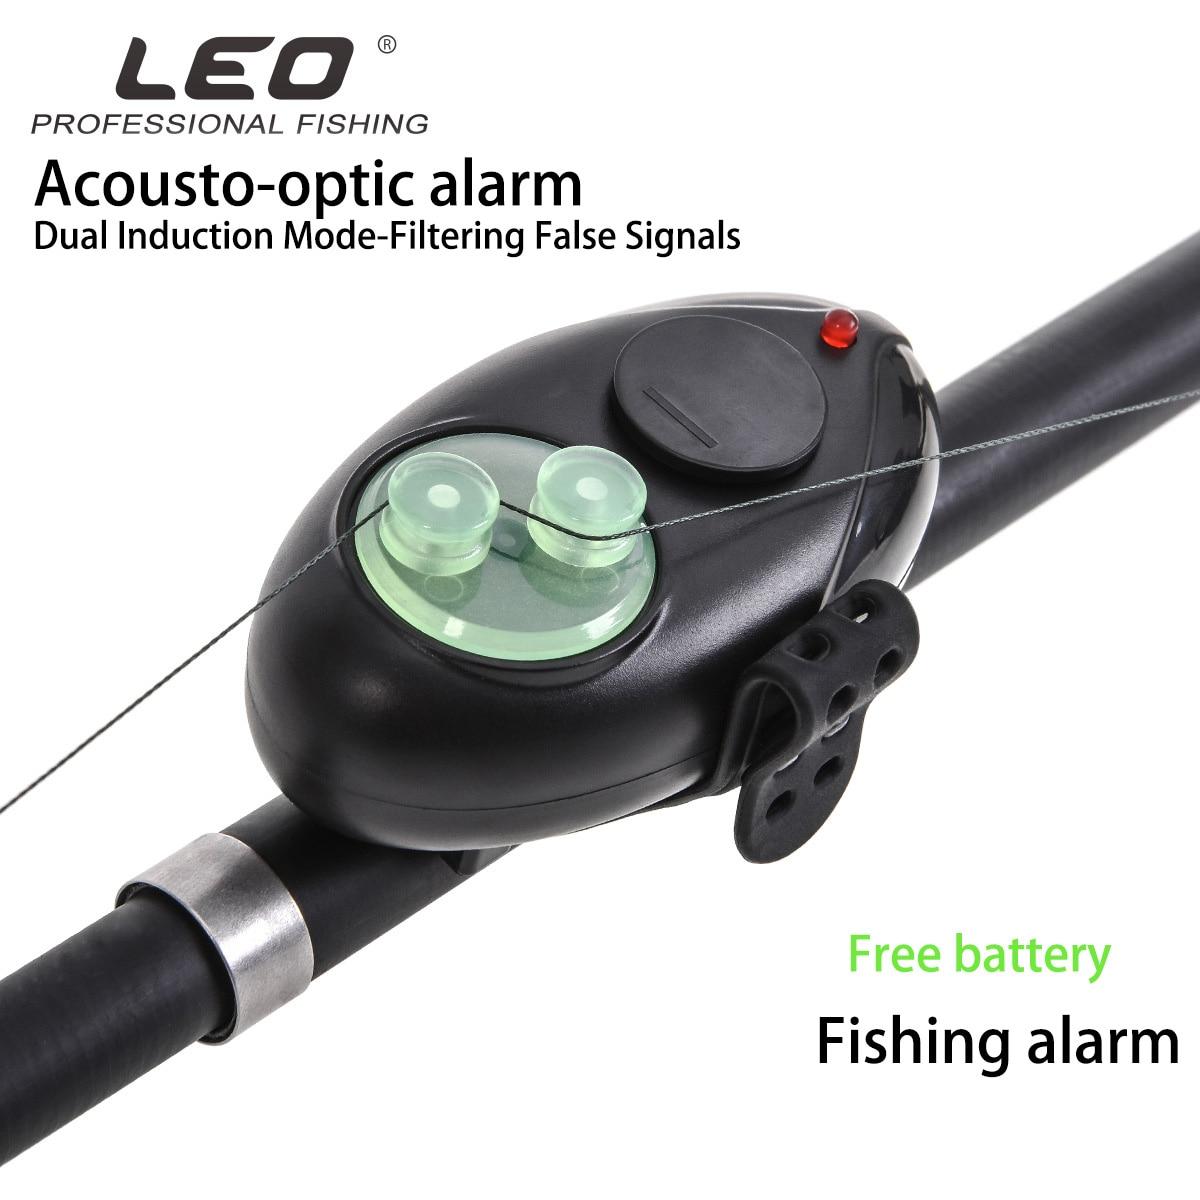 Leo Sea Fishing Alarm 28041 Bundled Acoustooptic Alarm Rock Fishing Accessories Pesca Electric Alarms Lure Tool PC Rubber Light